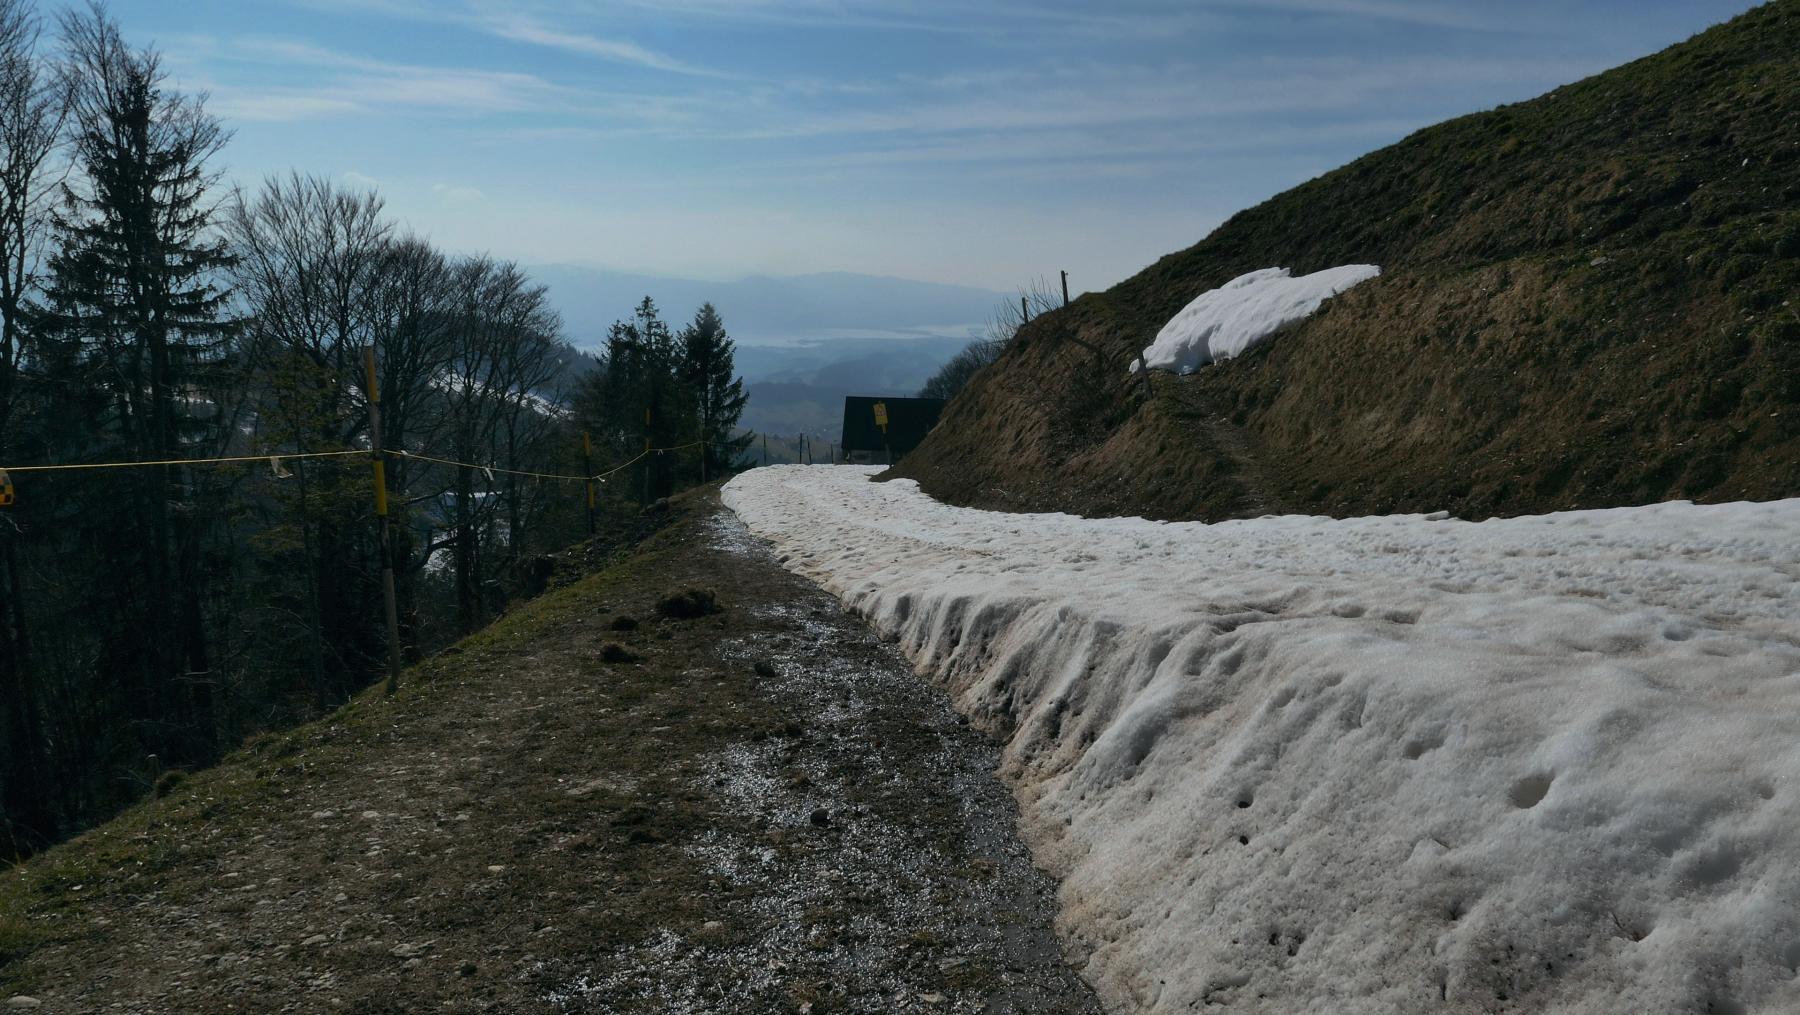 19b Atzmännig Bergstation